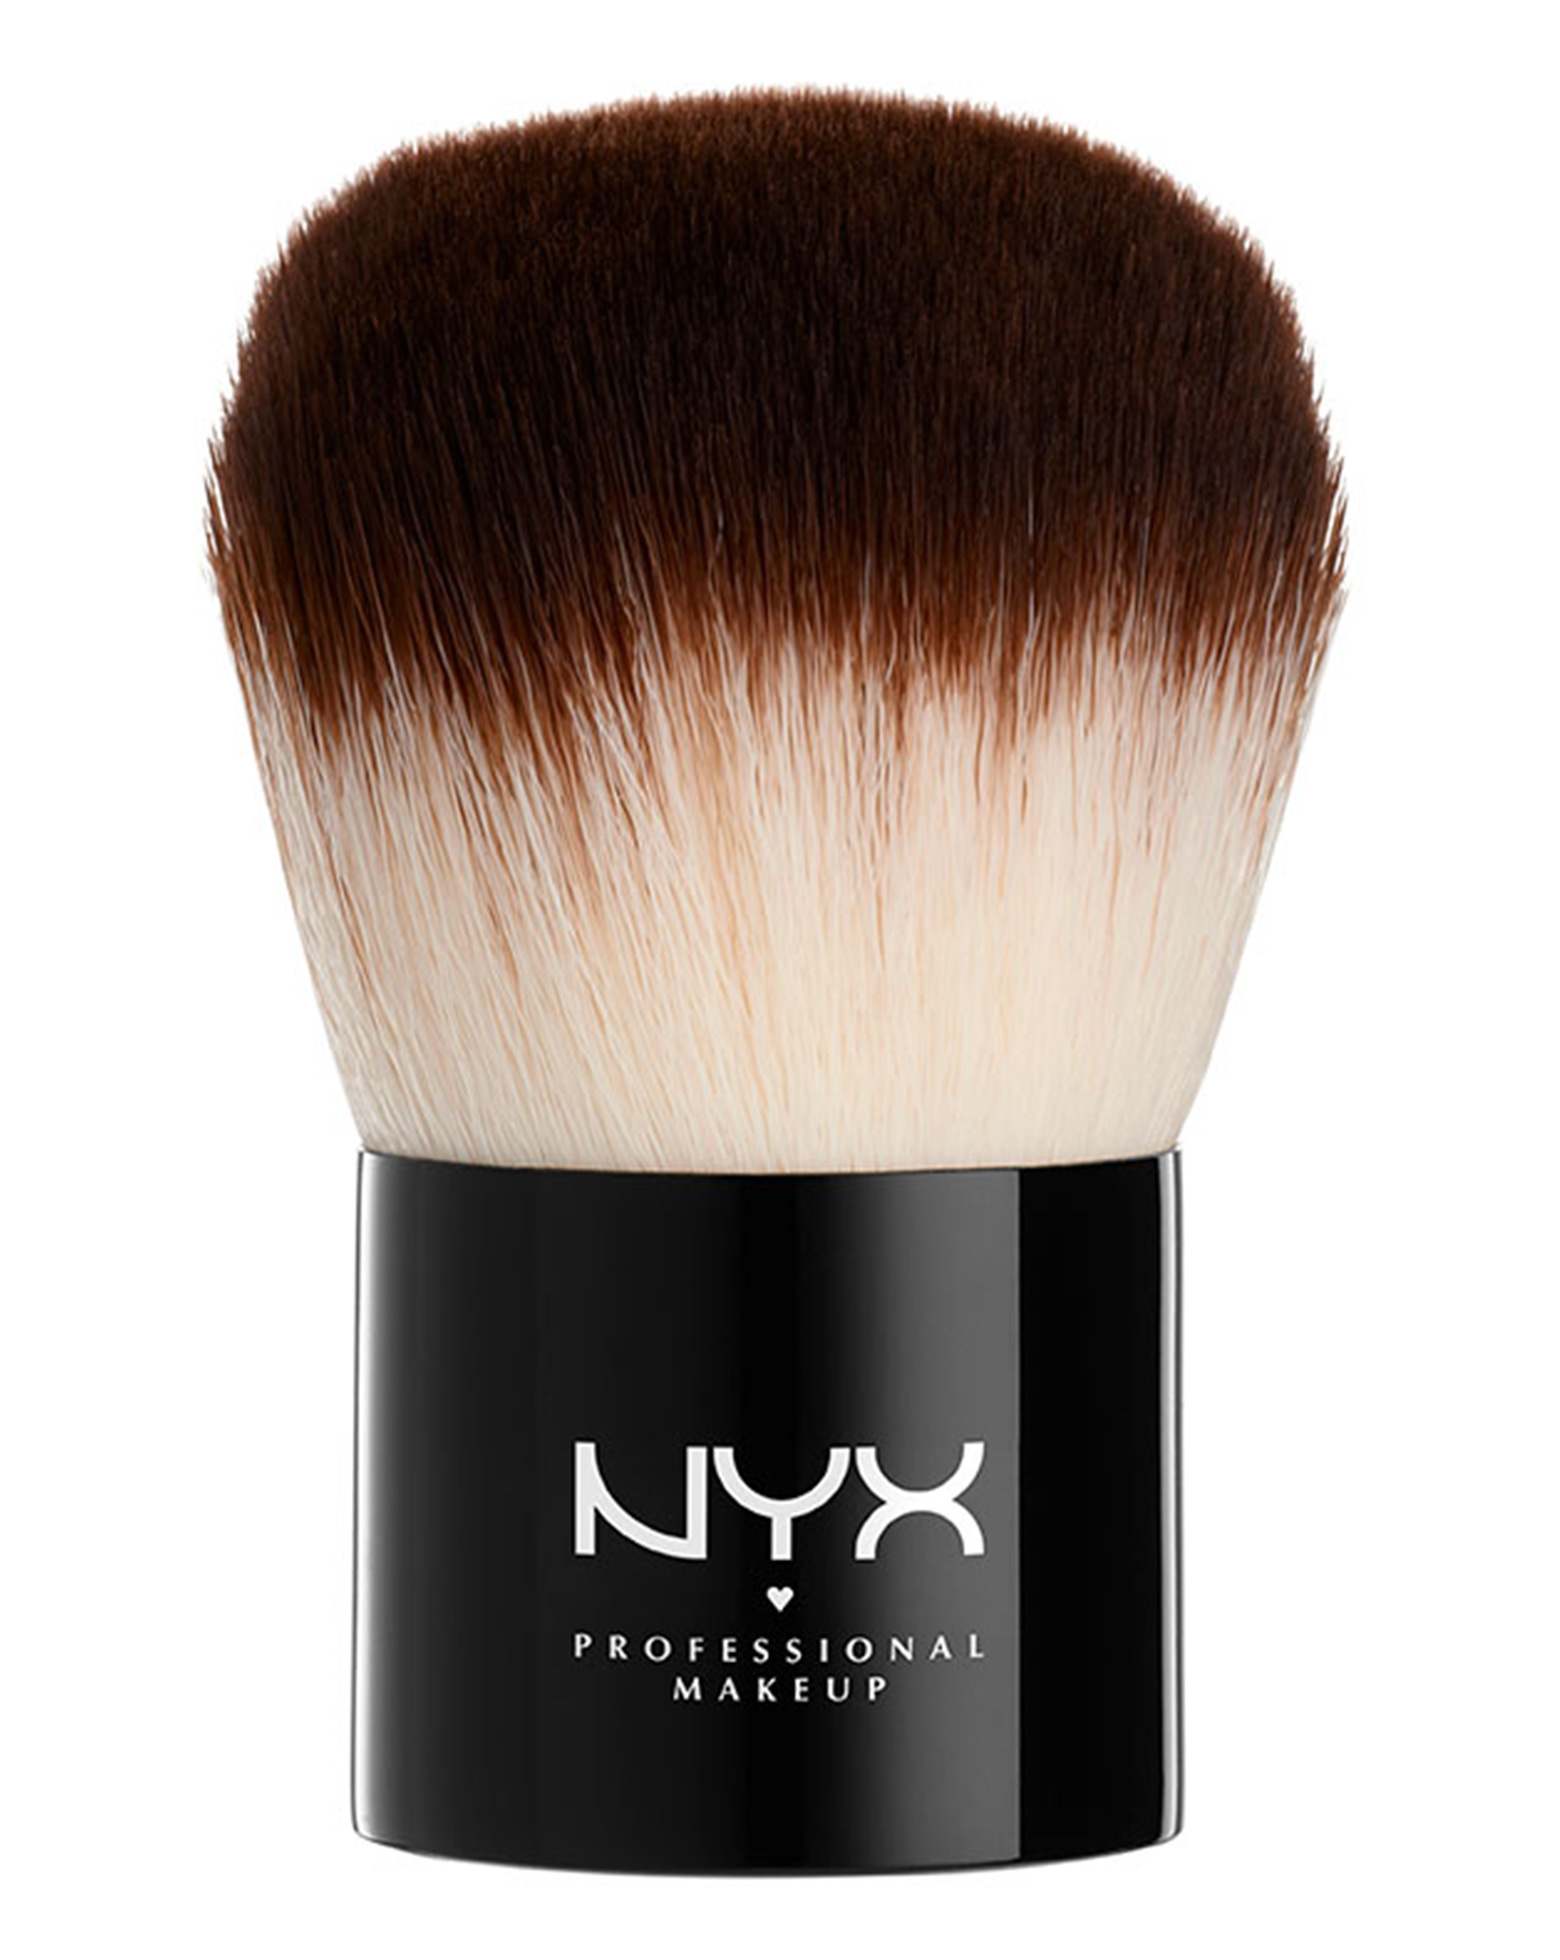 NYX Professional Makeup - Pro Kabuki Brush